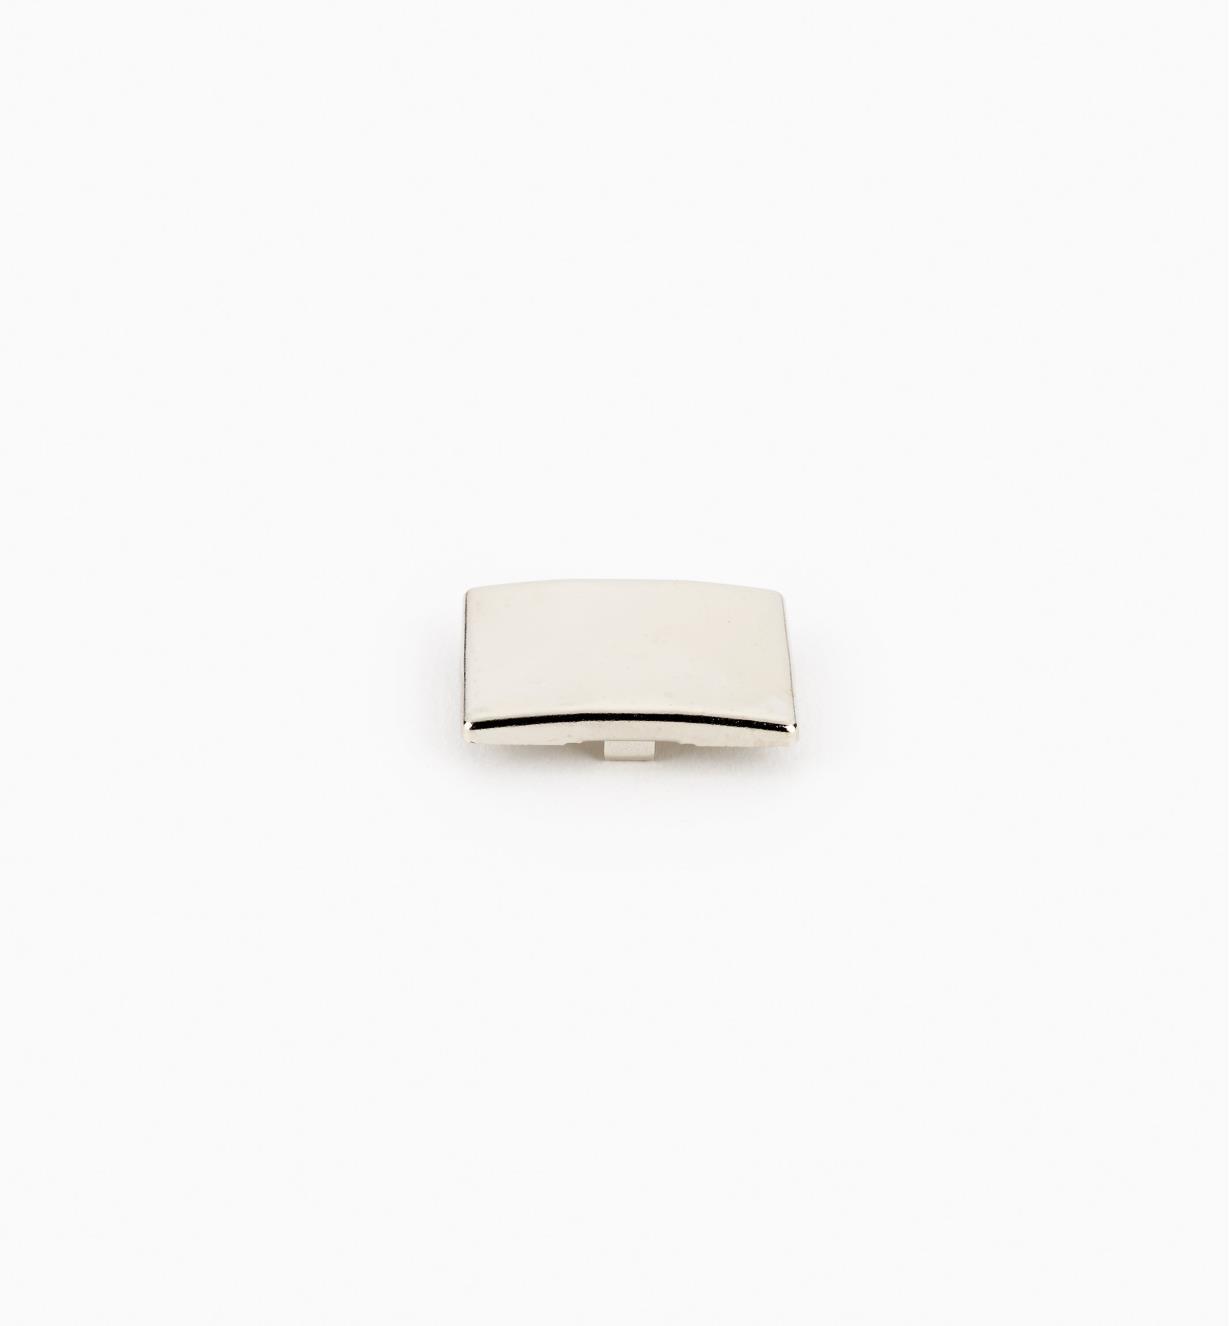 00B1557 - Compact Blumotion 110° Overlay Hinge Cap, each